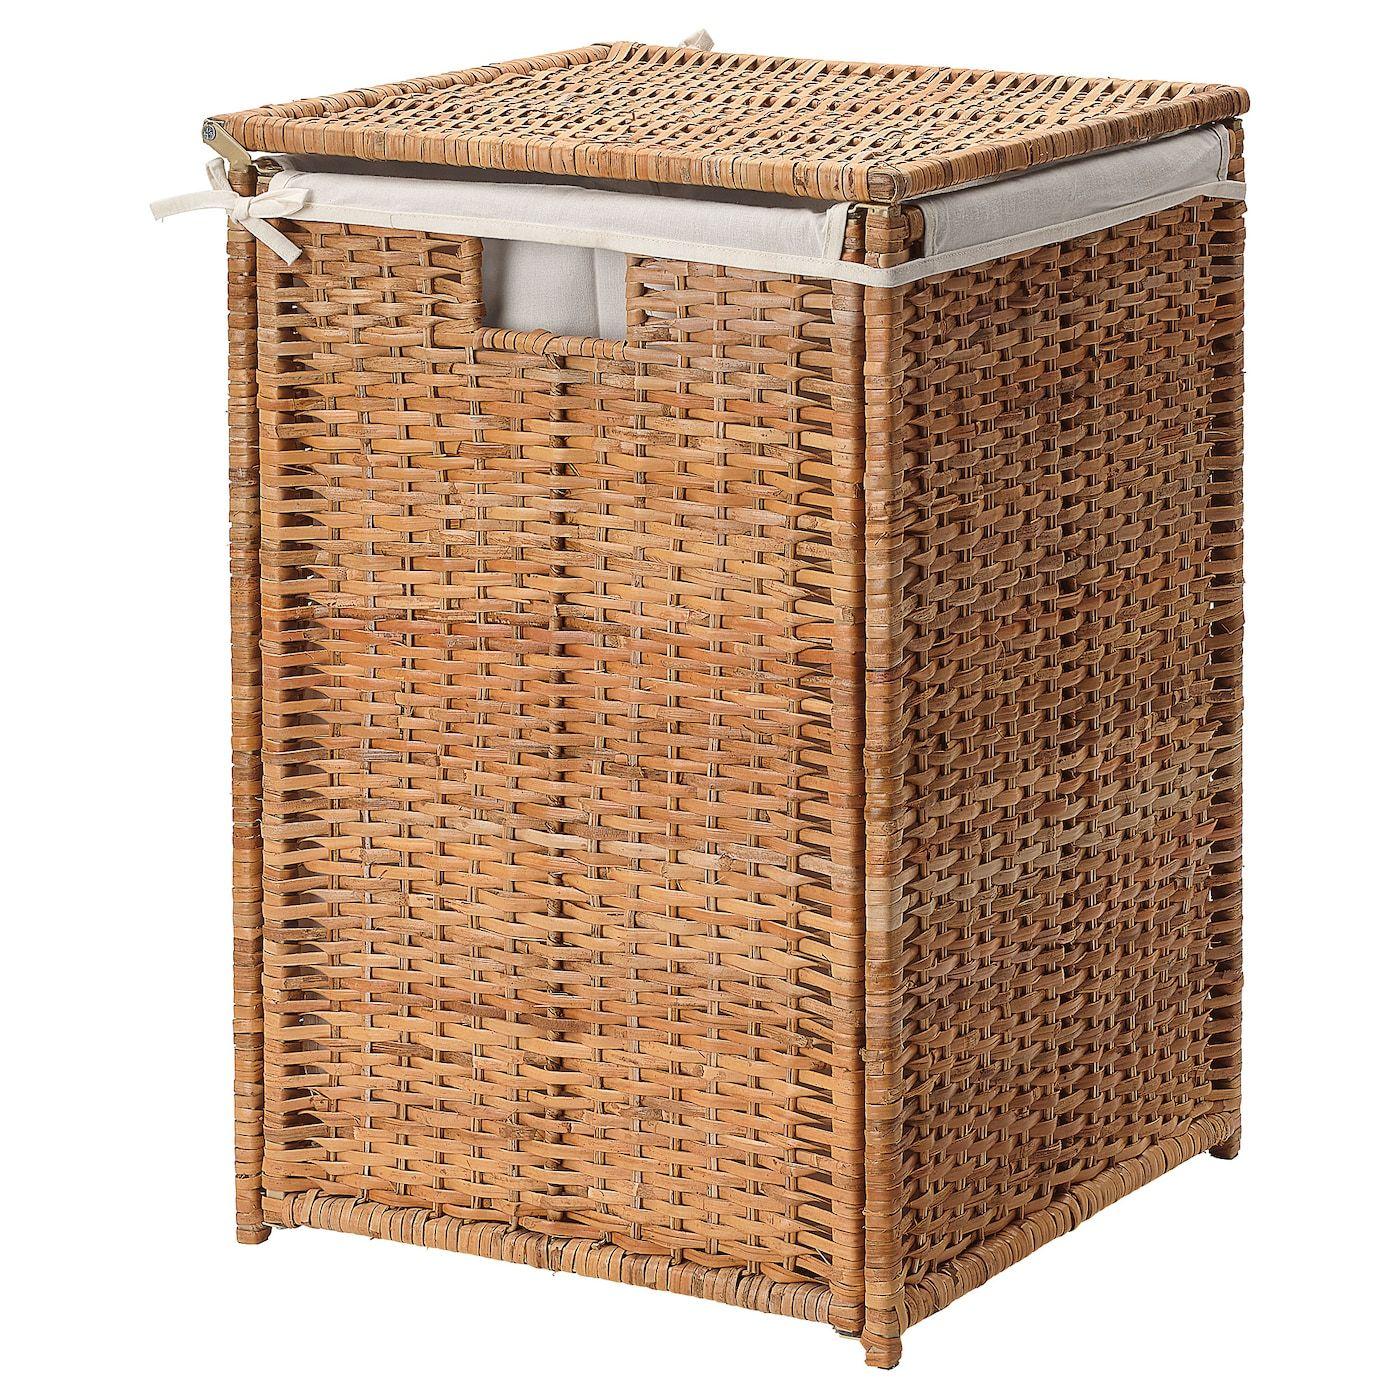 Ikea Branas Laundry Basket With Lining Rattan Laundry Basket